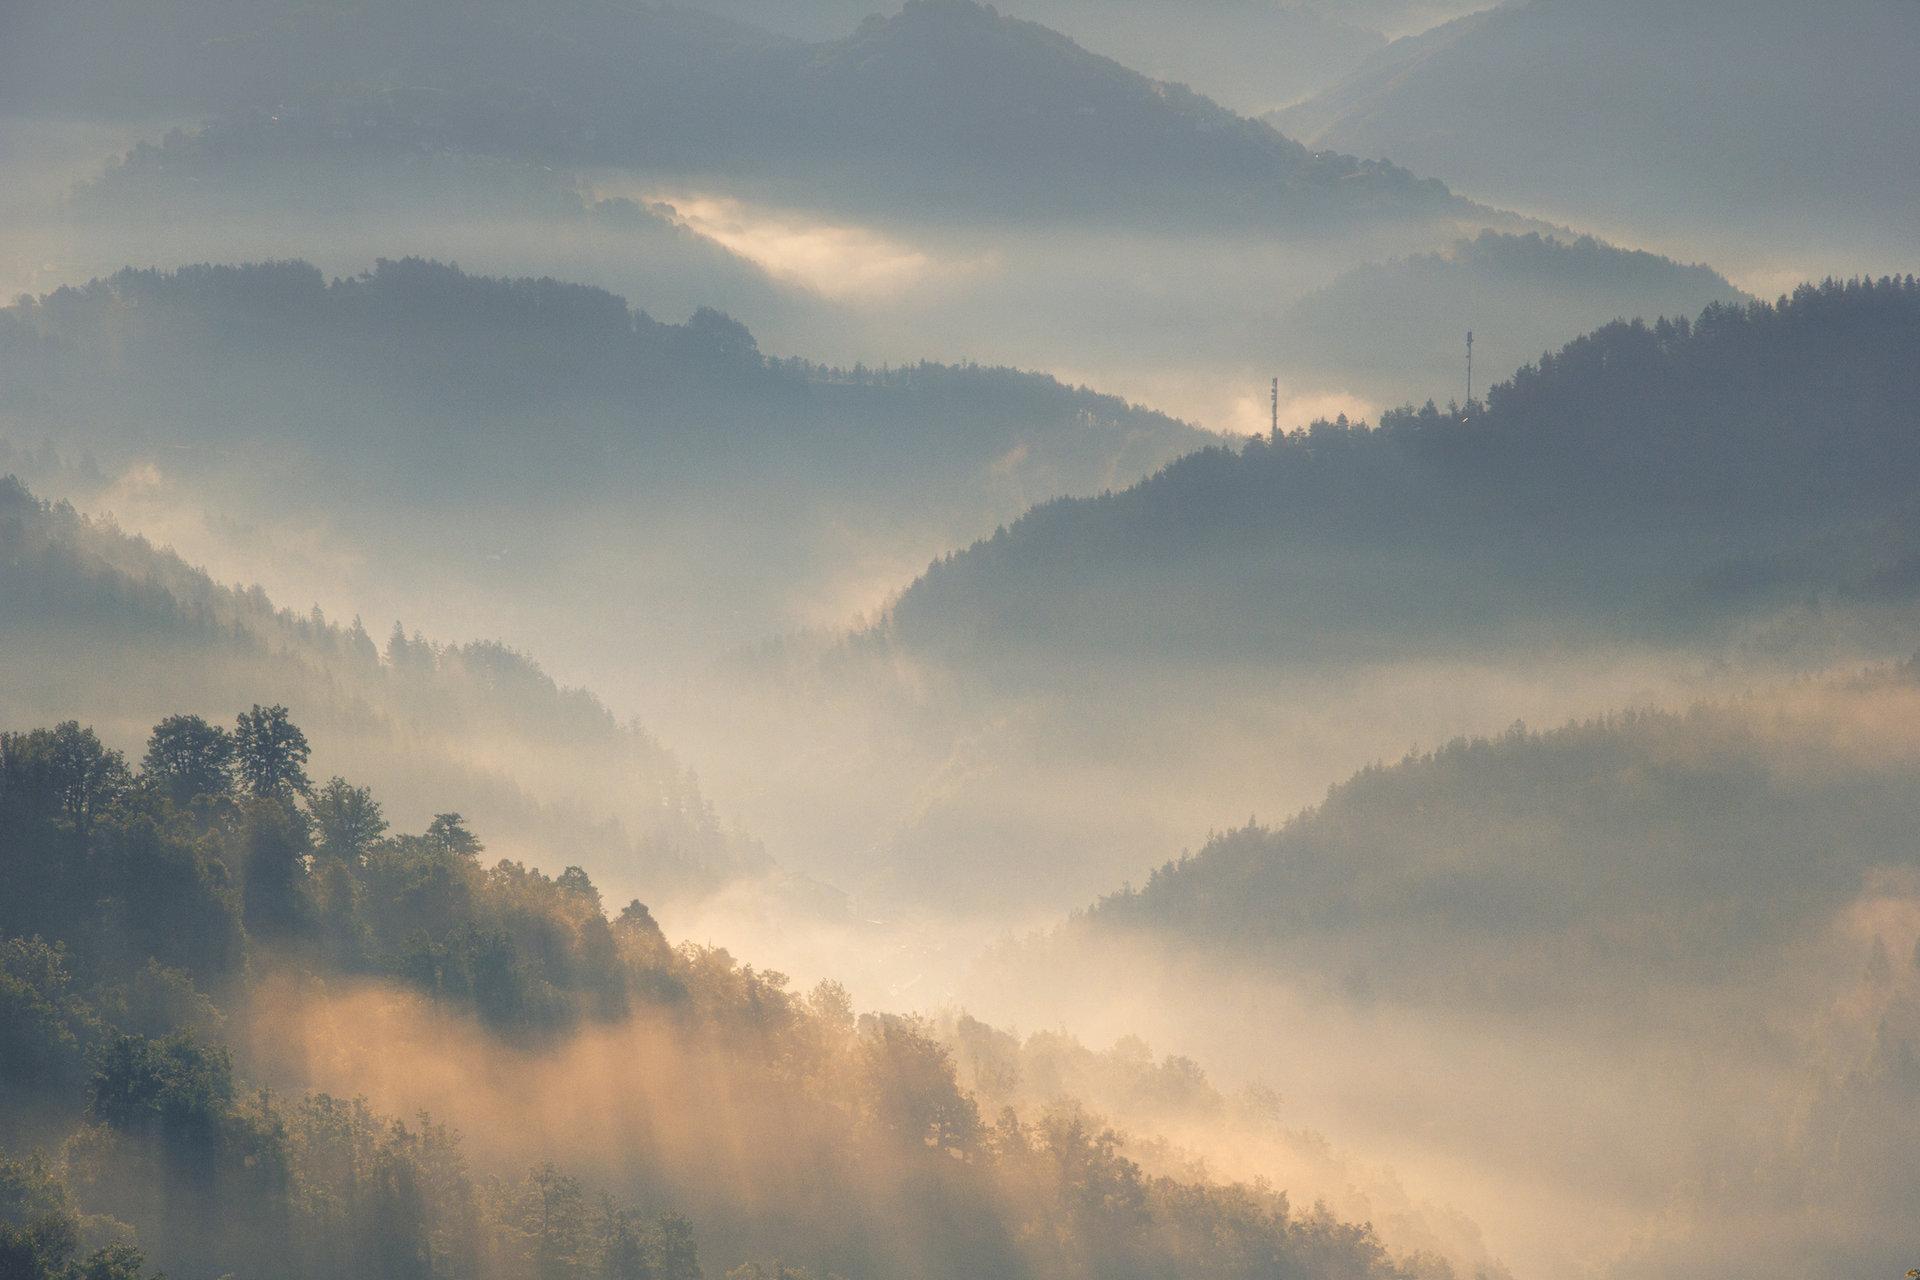 Photo in Landscape | Author miro63 | PHOTO FORUM